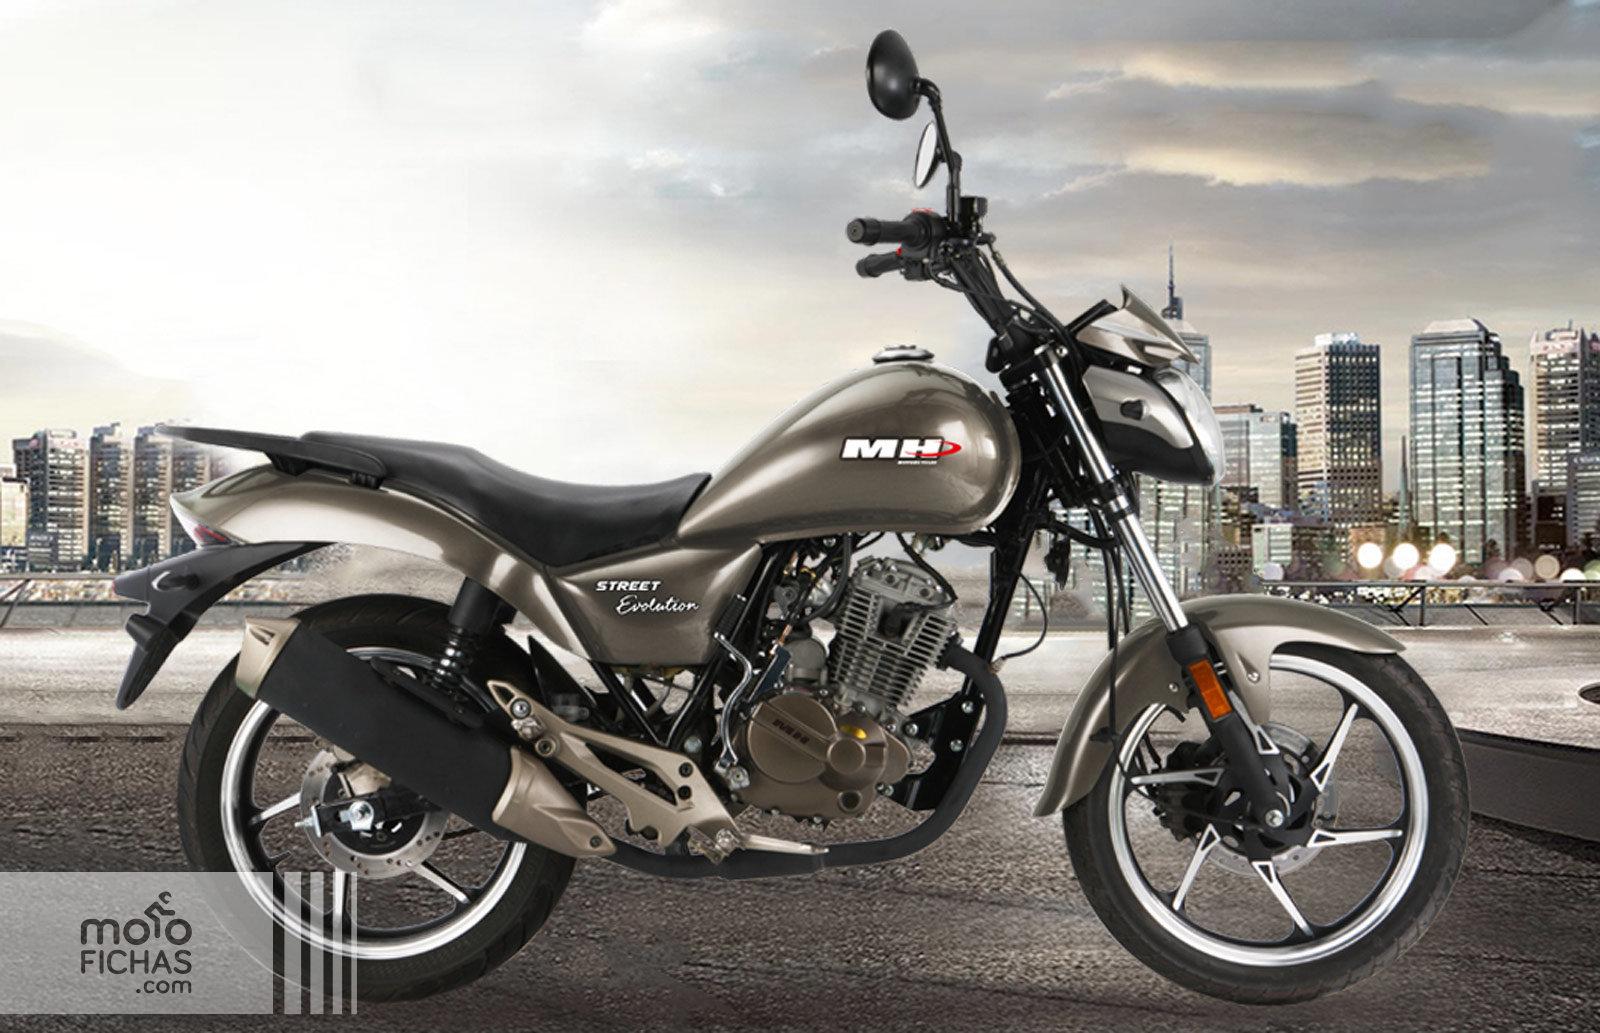 MH Motorcycles Street Evolution 125 2017-2019 precio ficha